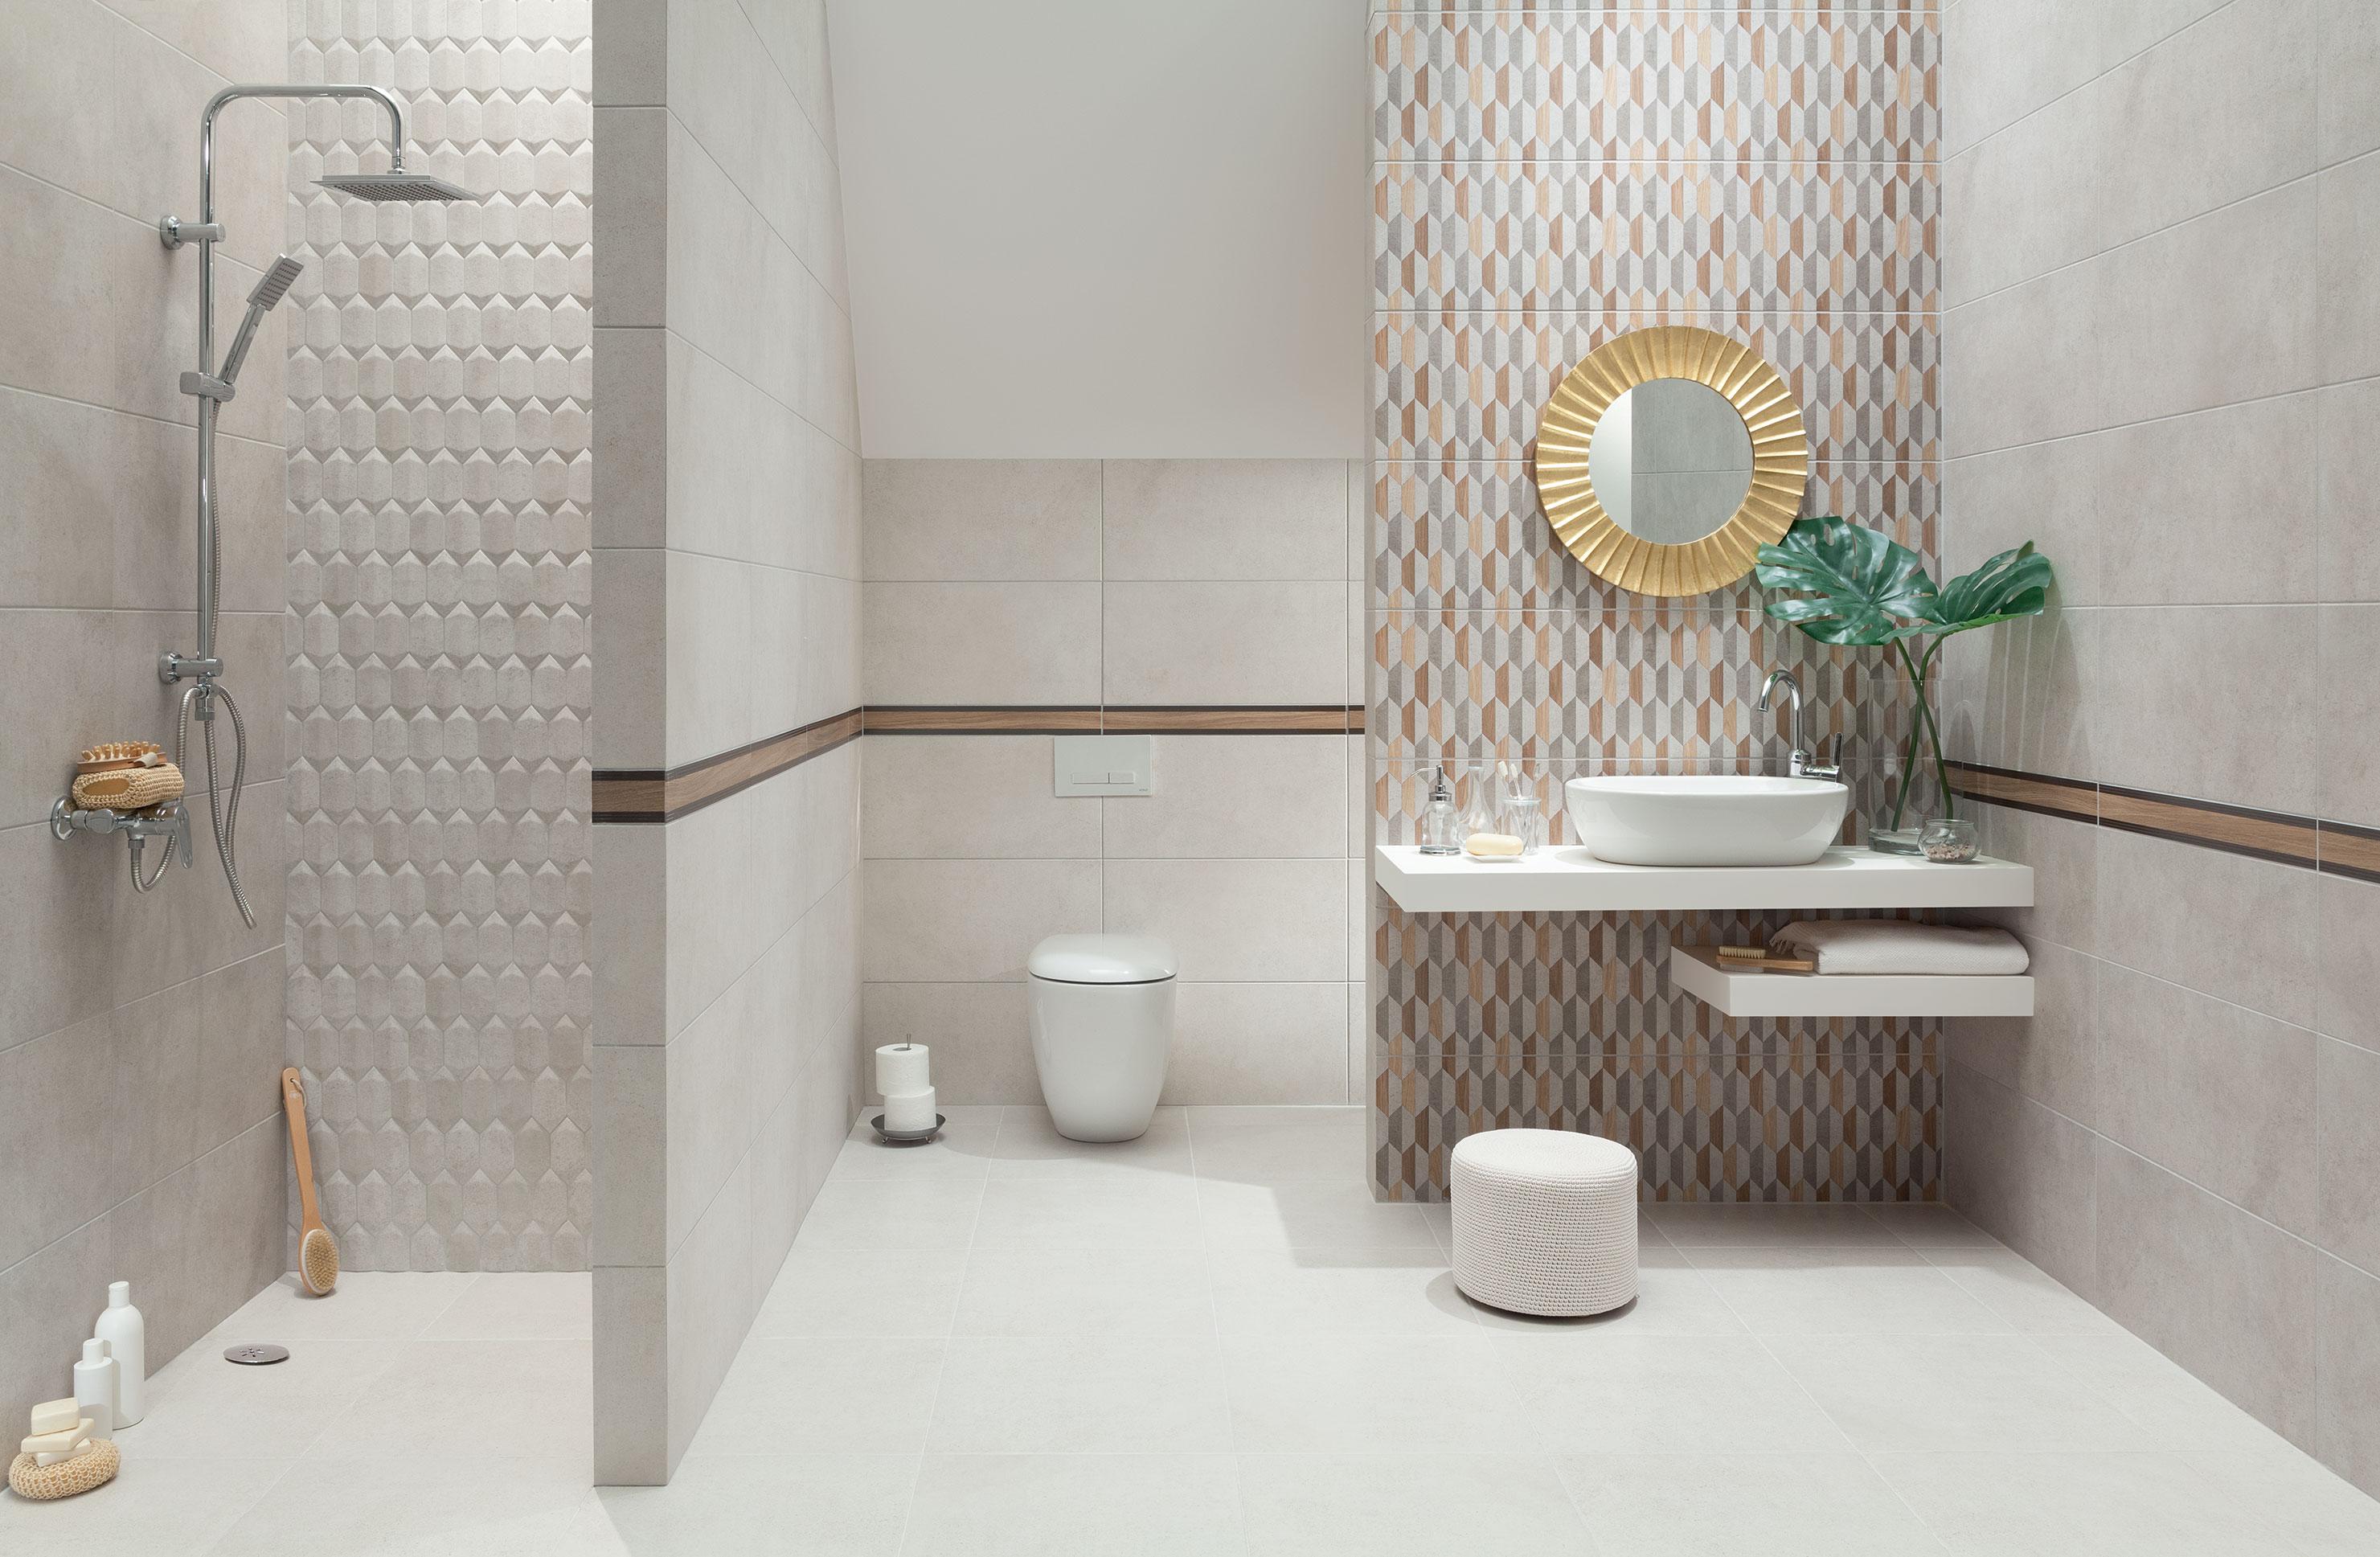 Dover łazienka Ceramika Dominopl